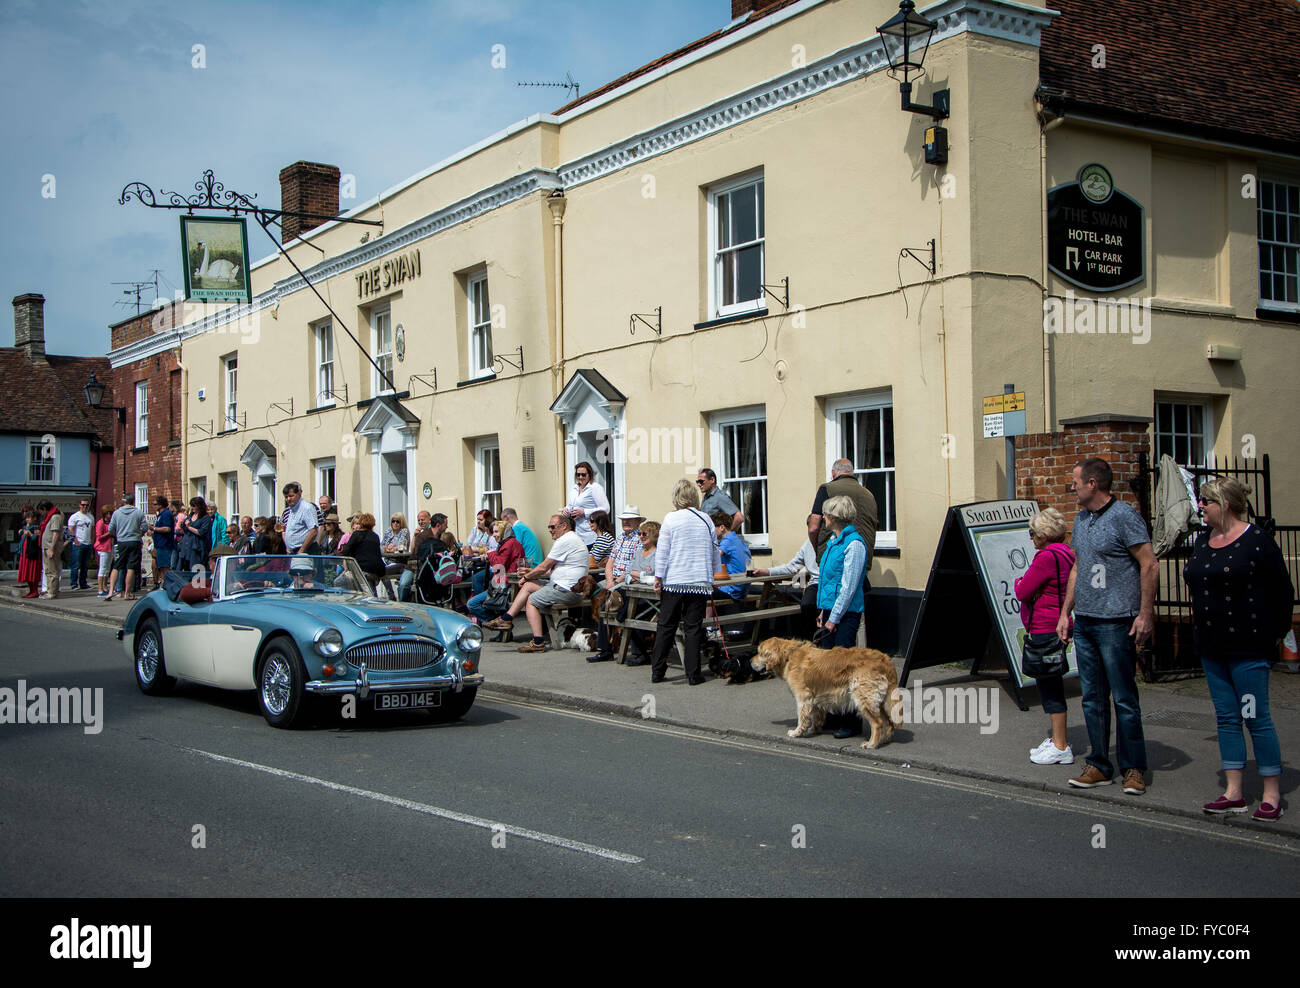 Punters enjoying warm weather, outdoors pub,  Thaxted, Essex, England - Stock Image